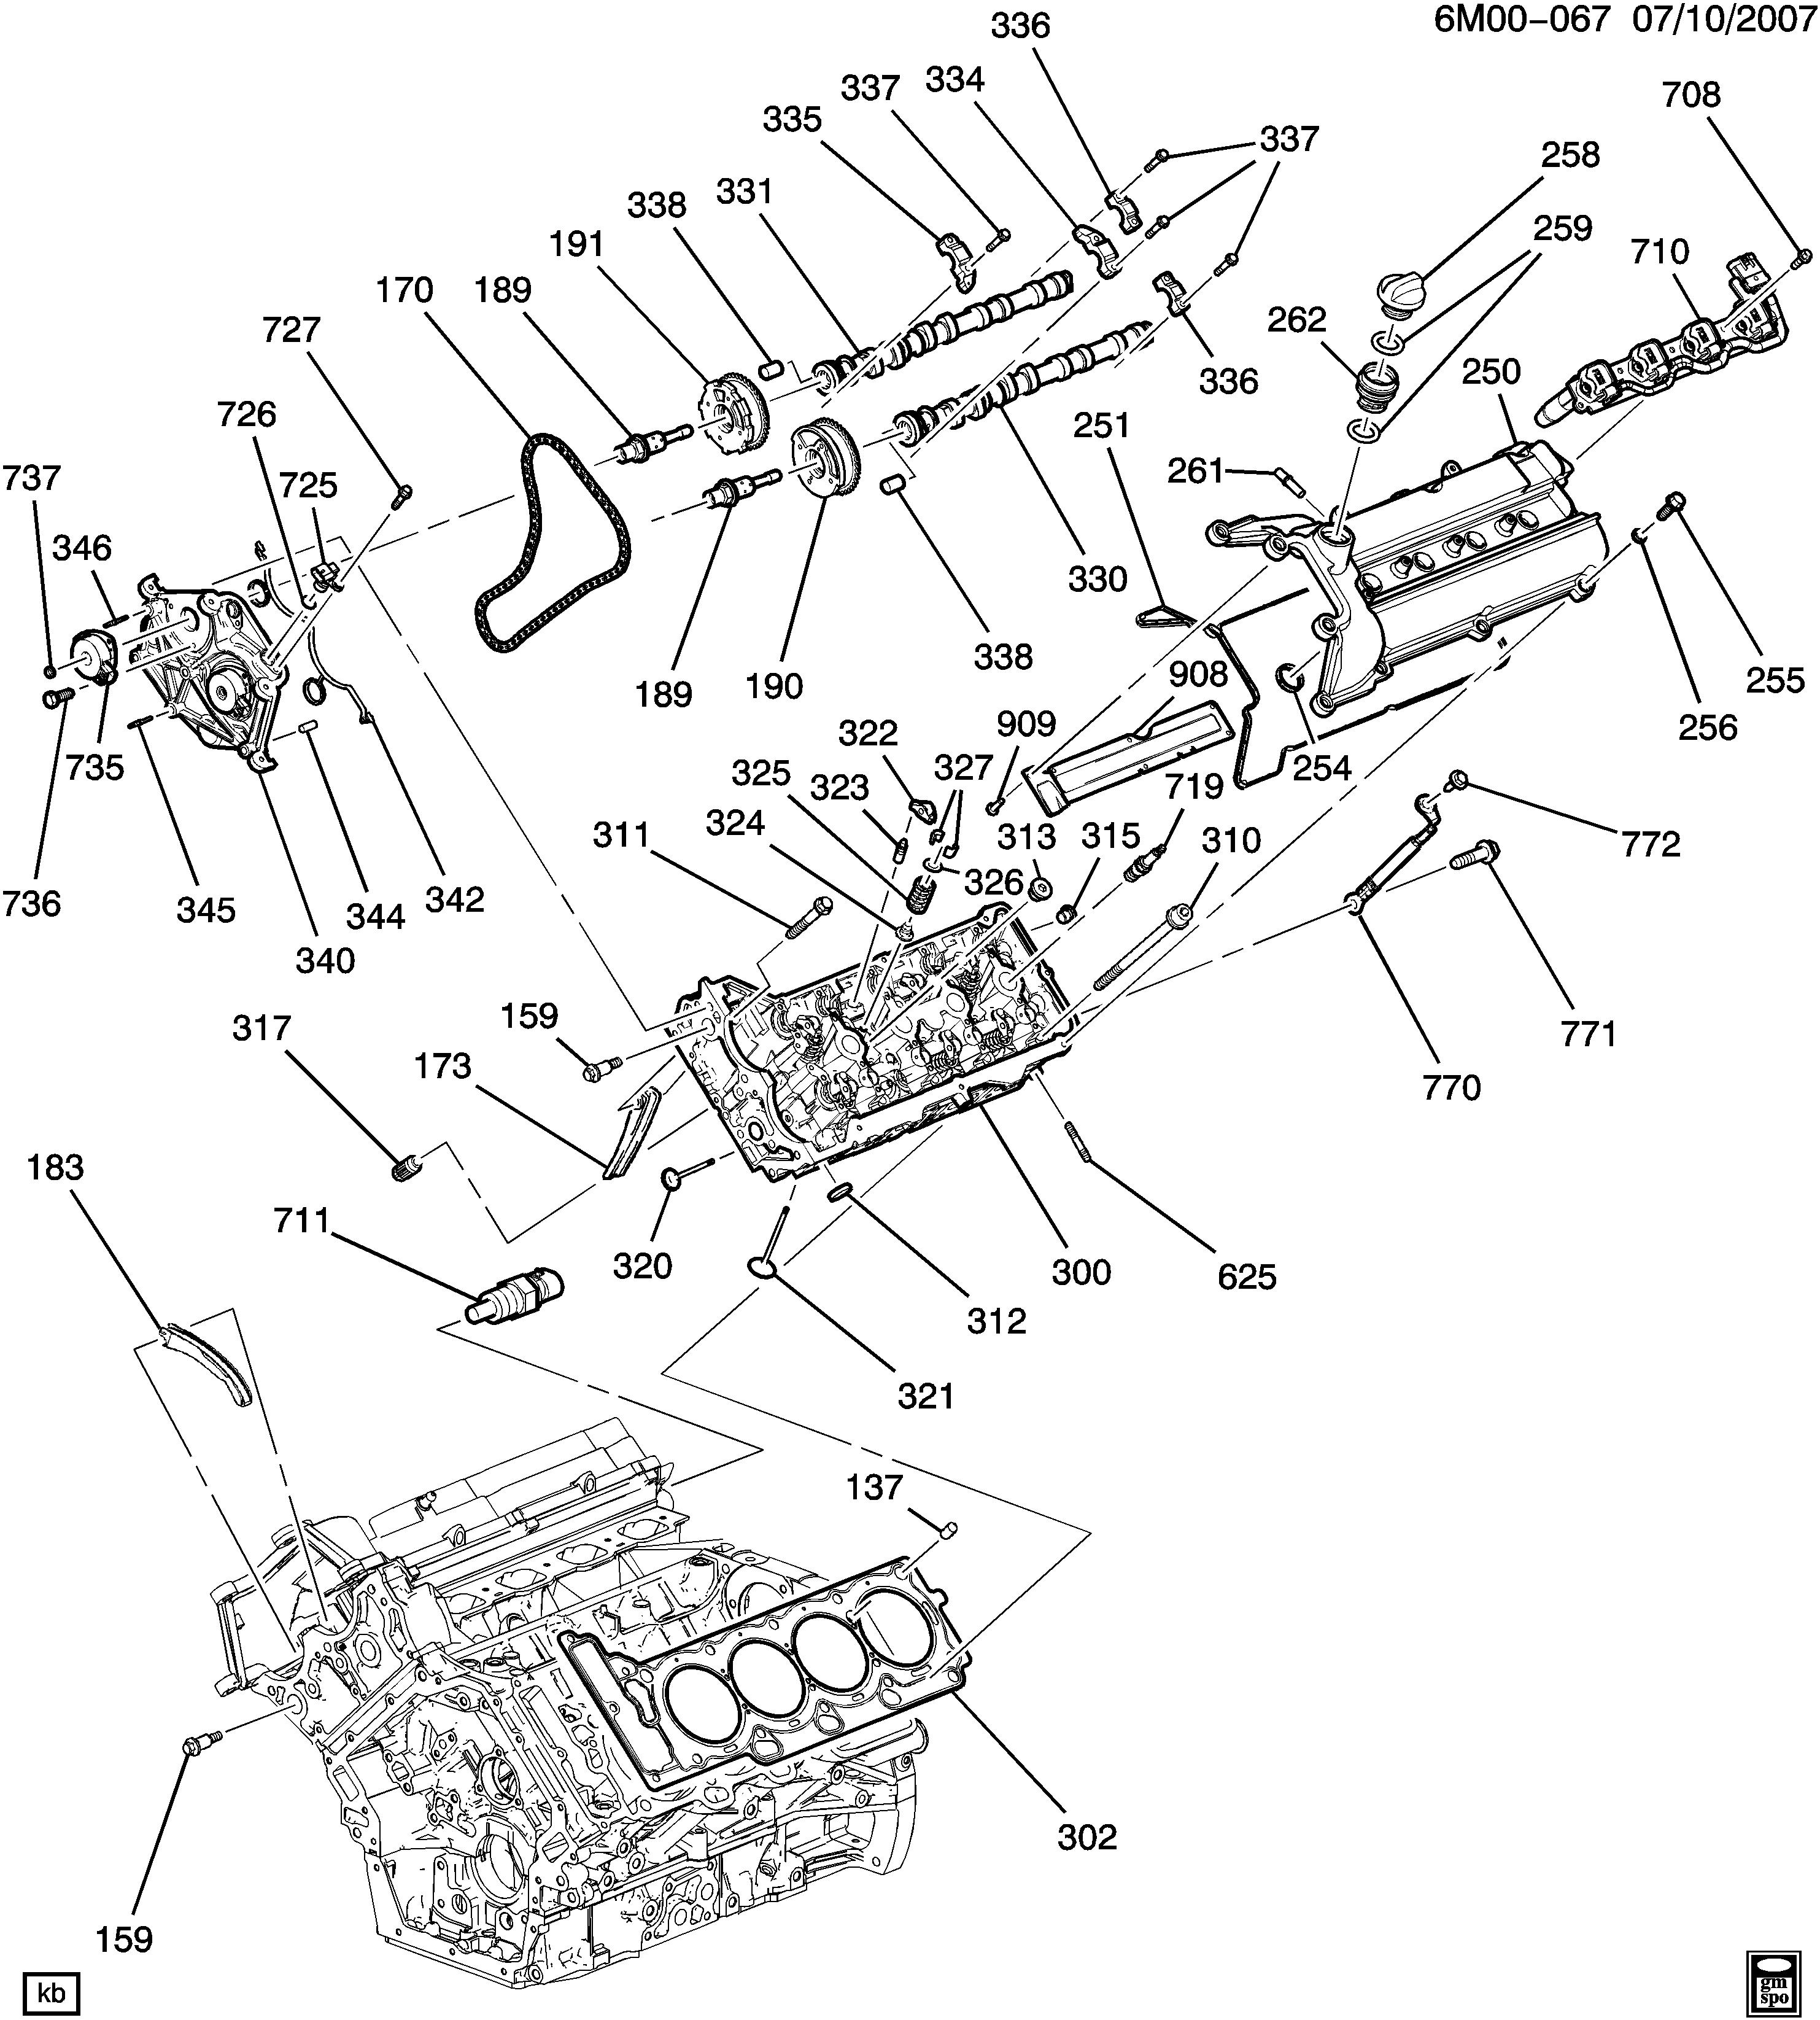 Ford Gt Engine Diagram